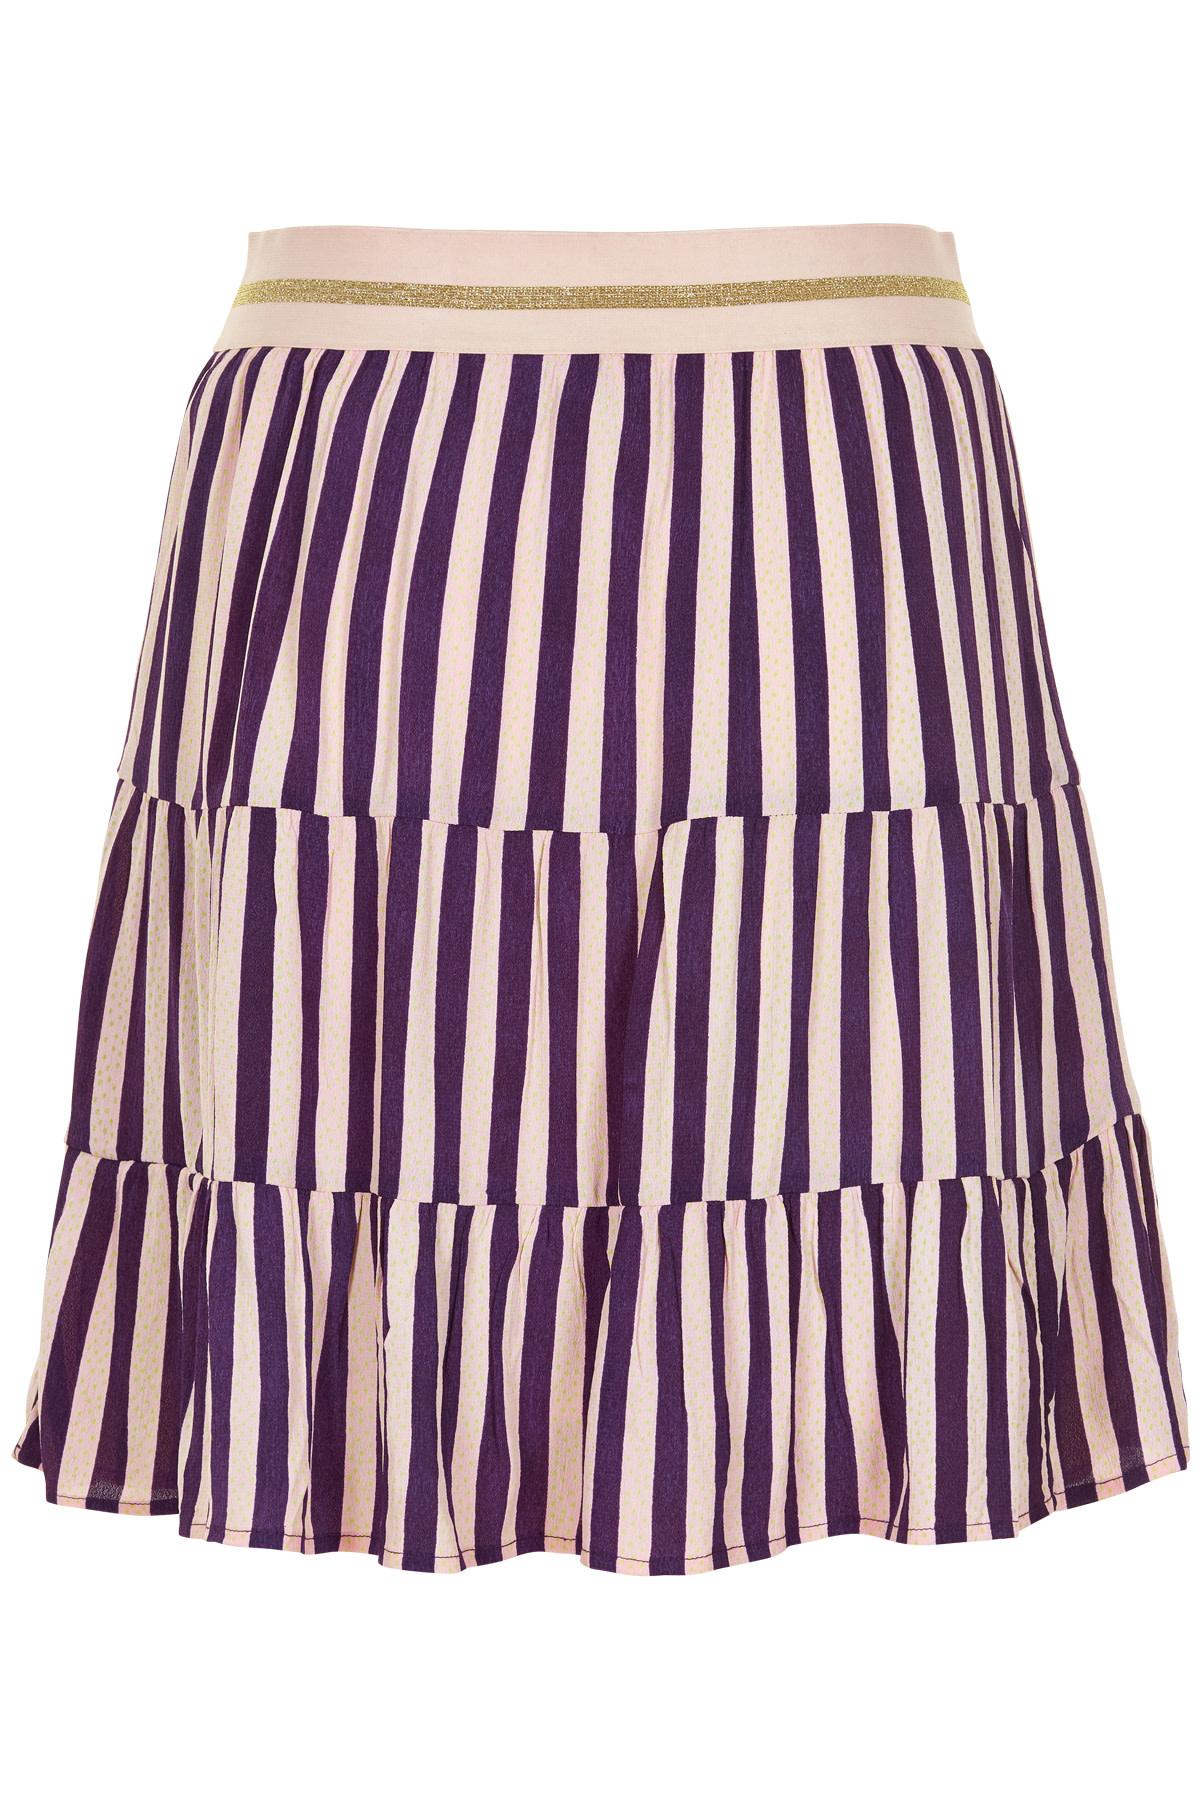 Nümph Kakalina Skirt